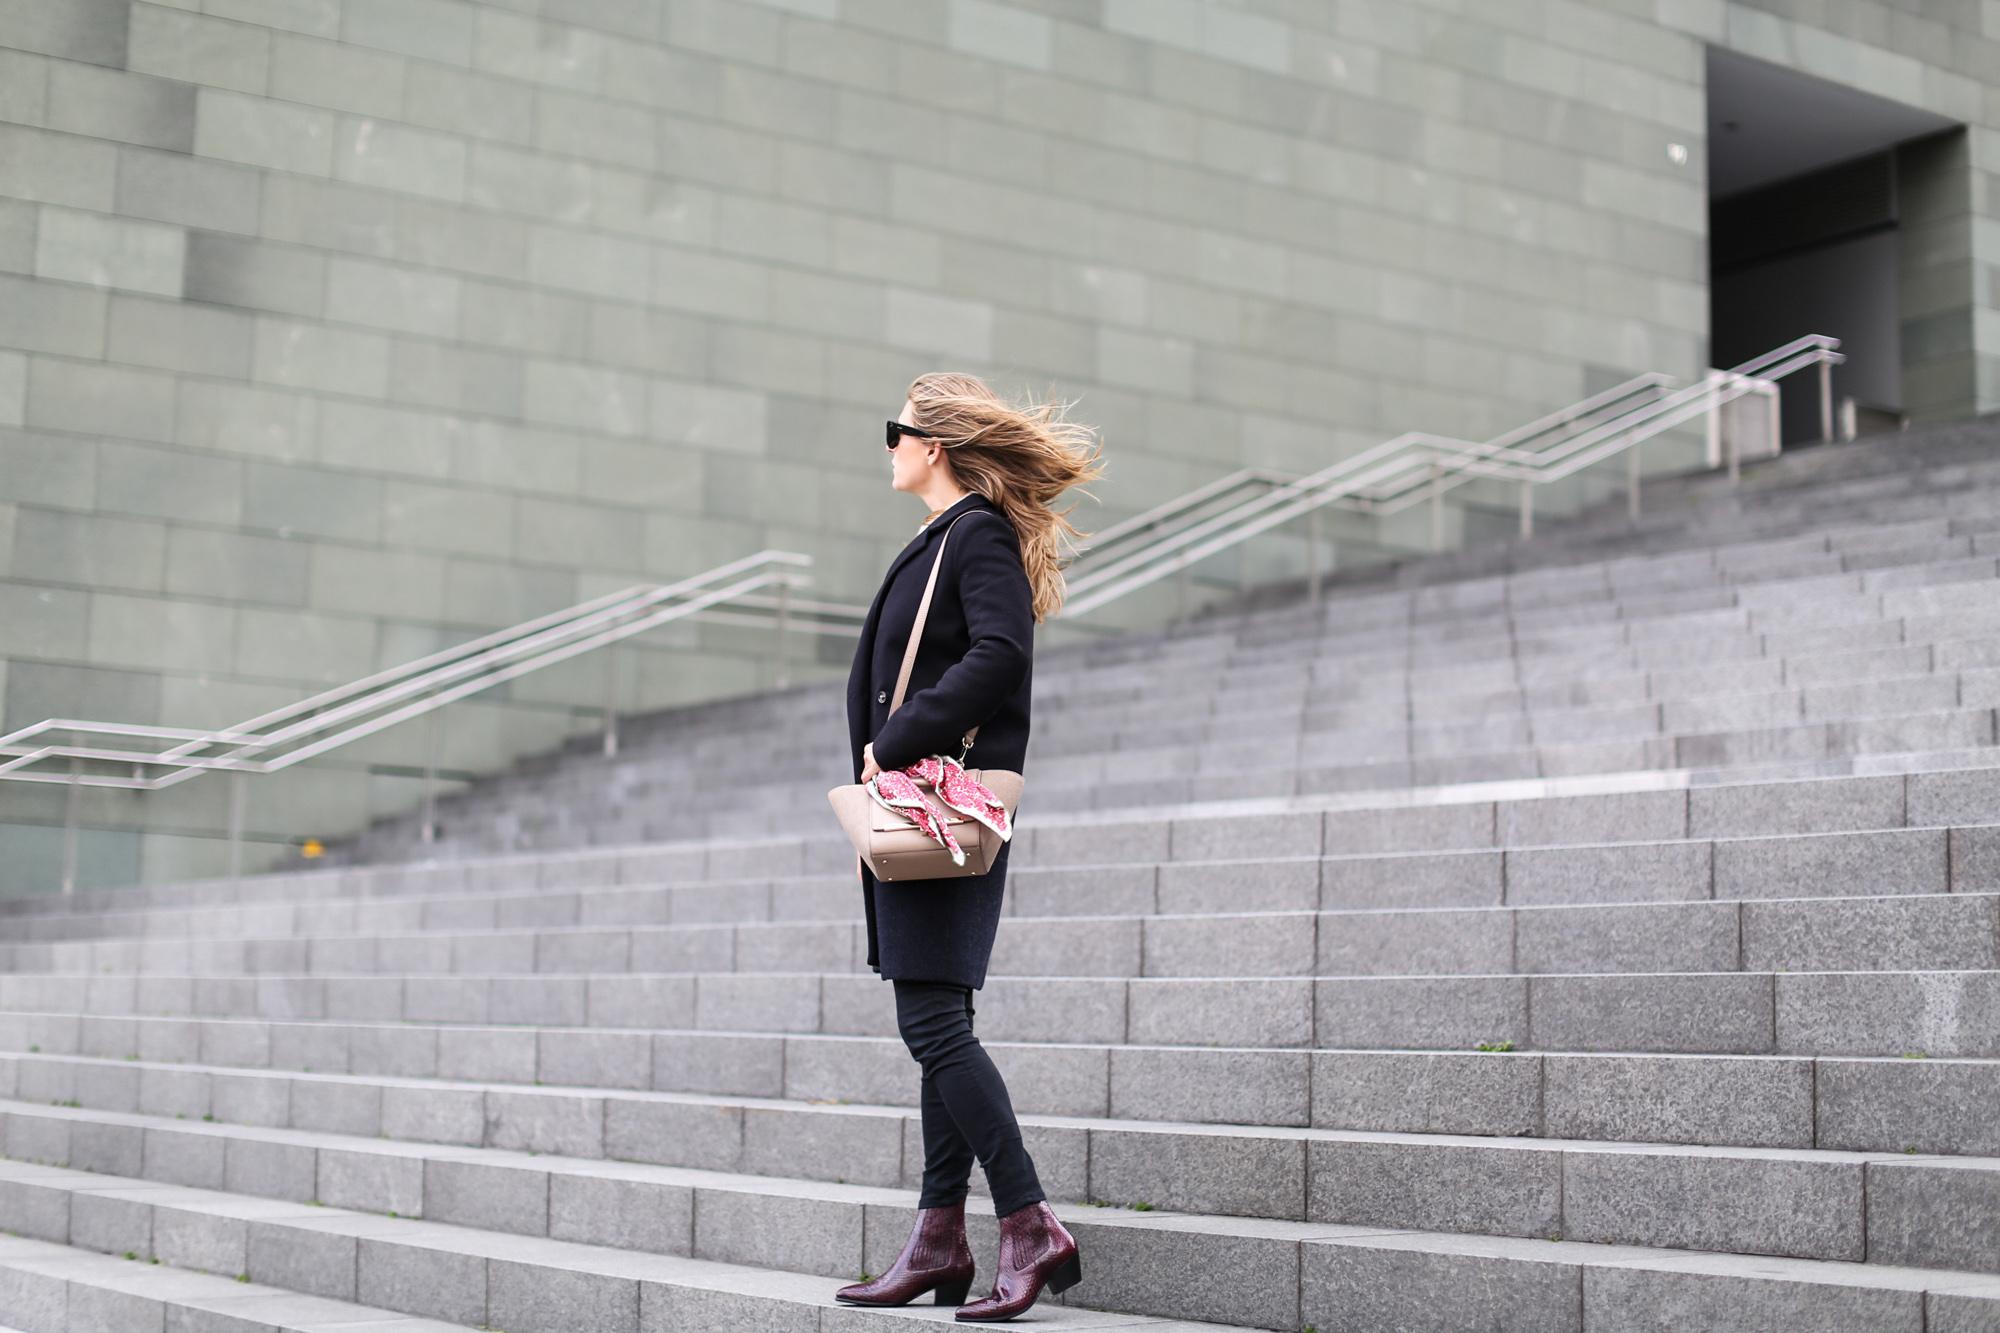 clochet_streetstyle_fashionbloggerbilbao_sandro_phytonleatherankleboots_purificaciongarcia_bolsopiel-4